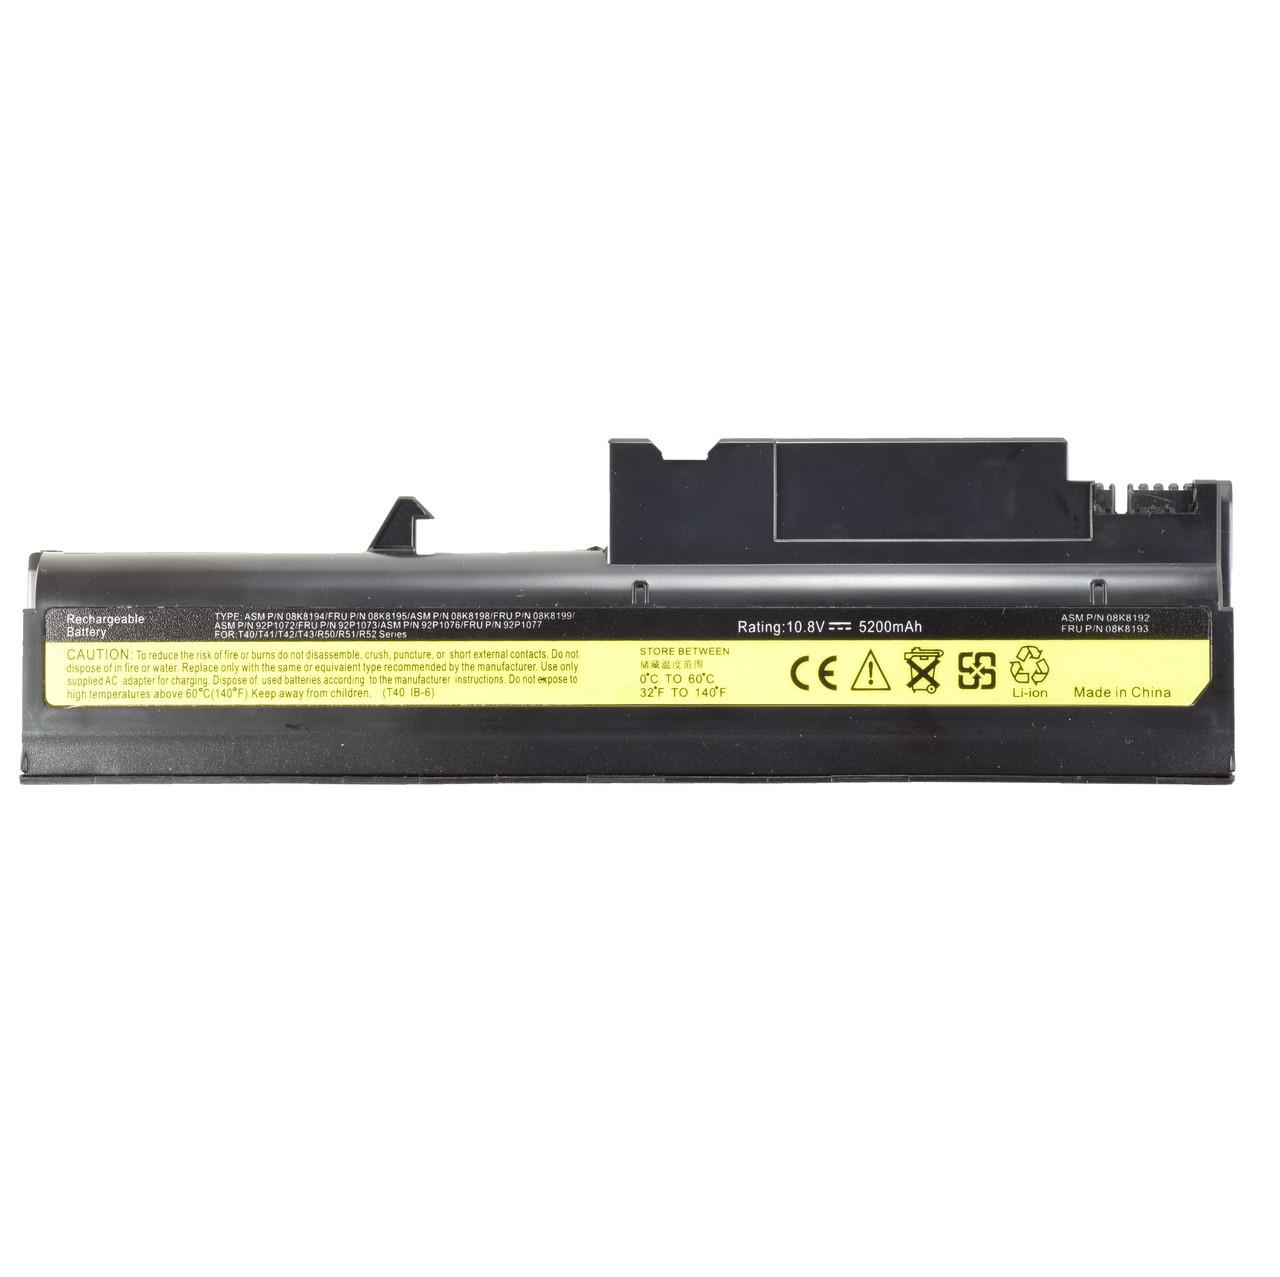 Батарея для ноутбука 08K8192 92P1064 FRU 08K8193 08K8195 08K8214 08K8190 08K8196 08K8197 08K8198